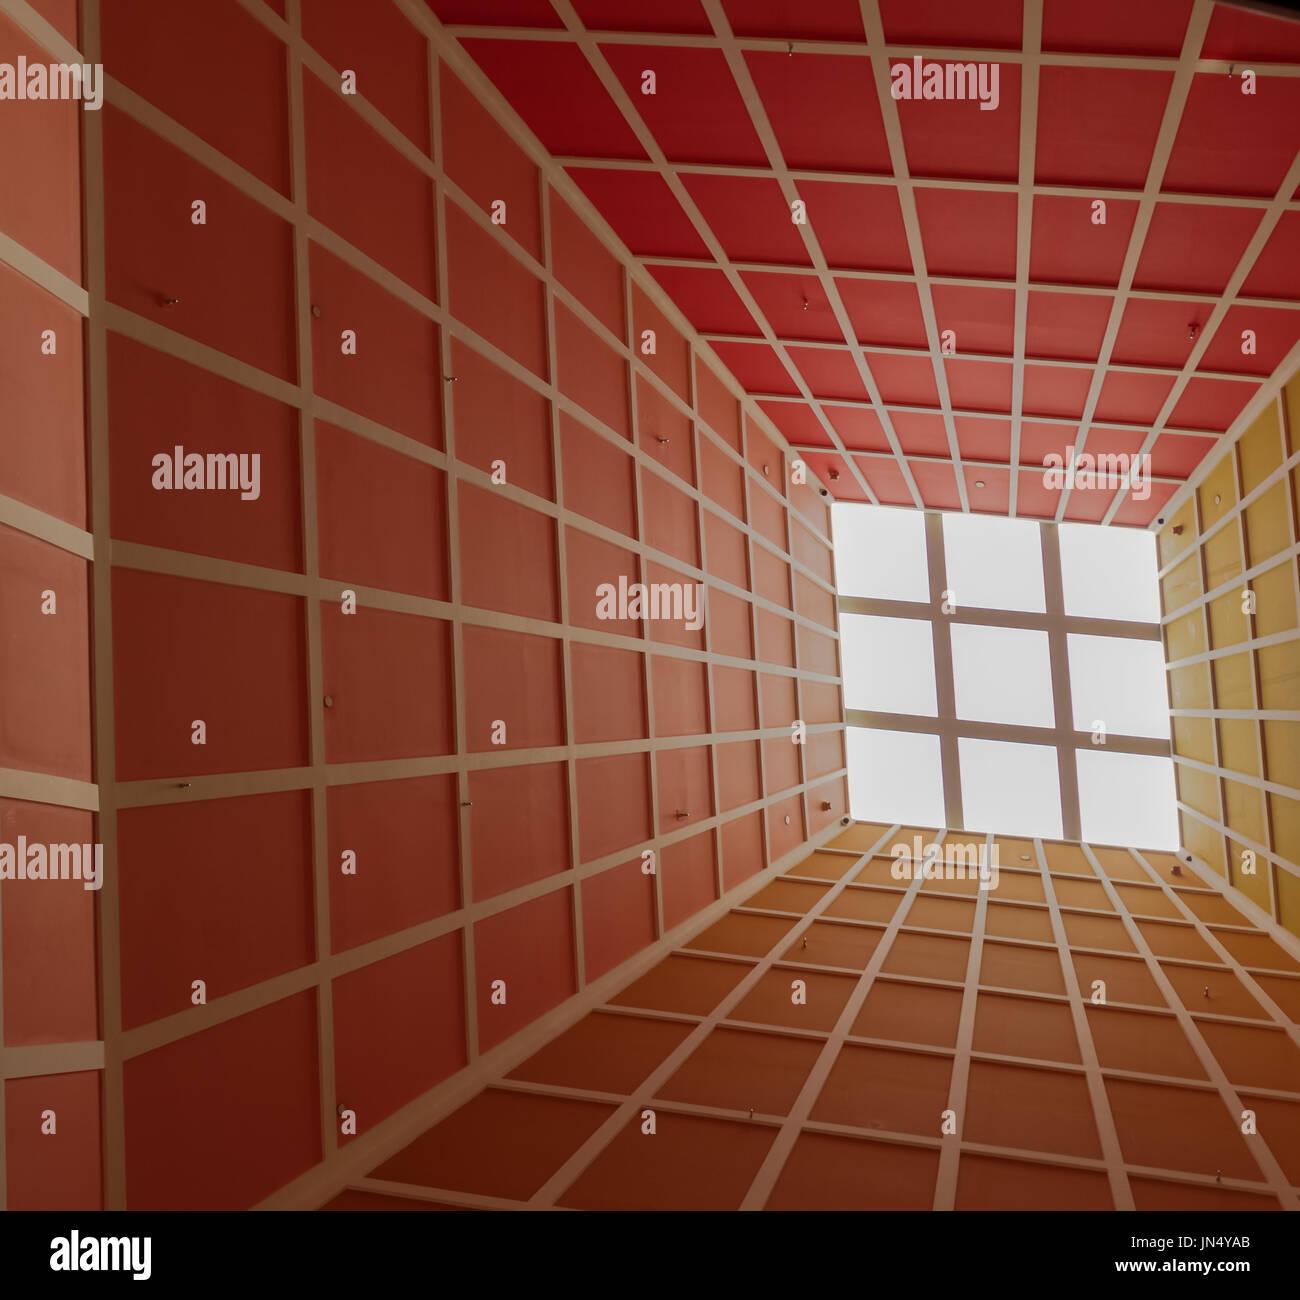 Lattice Design Stockfotos & Lattice Design Bilder - Alamy